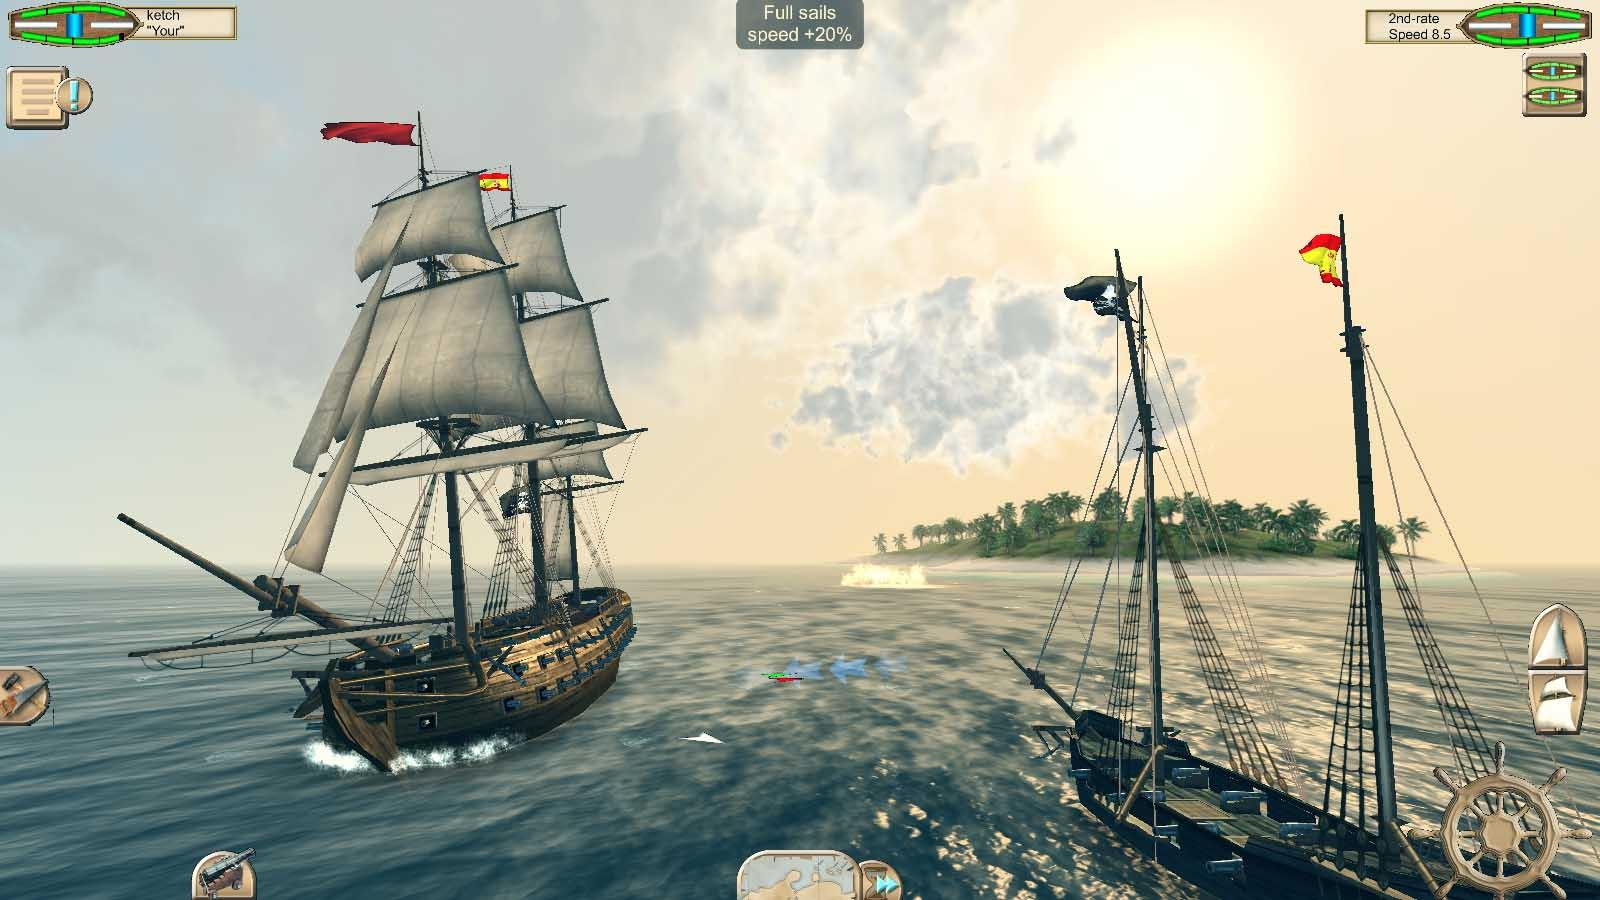 the-pirate-caribbean-hunt-apk